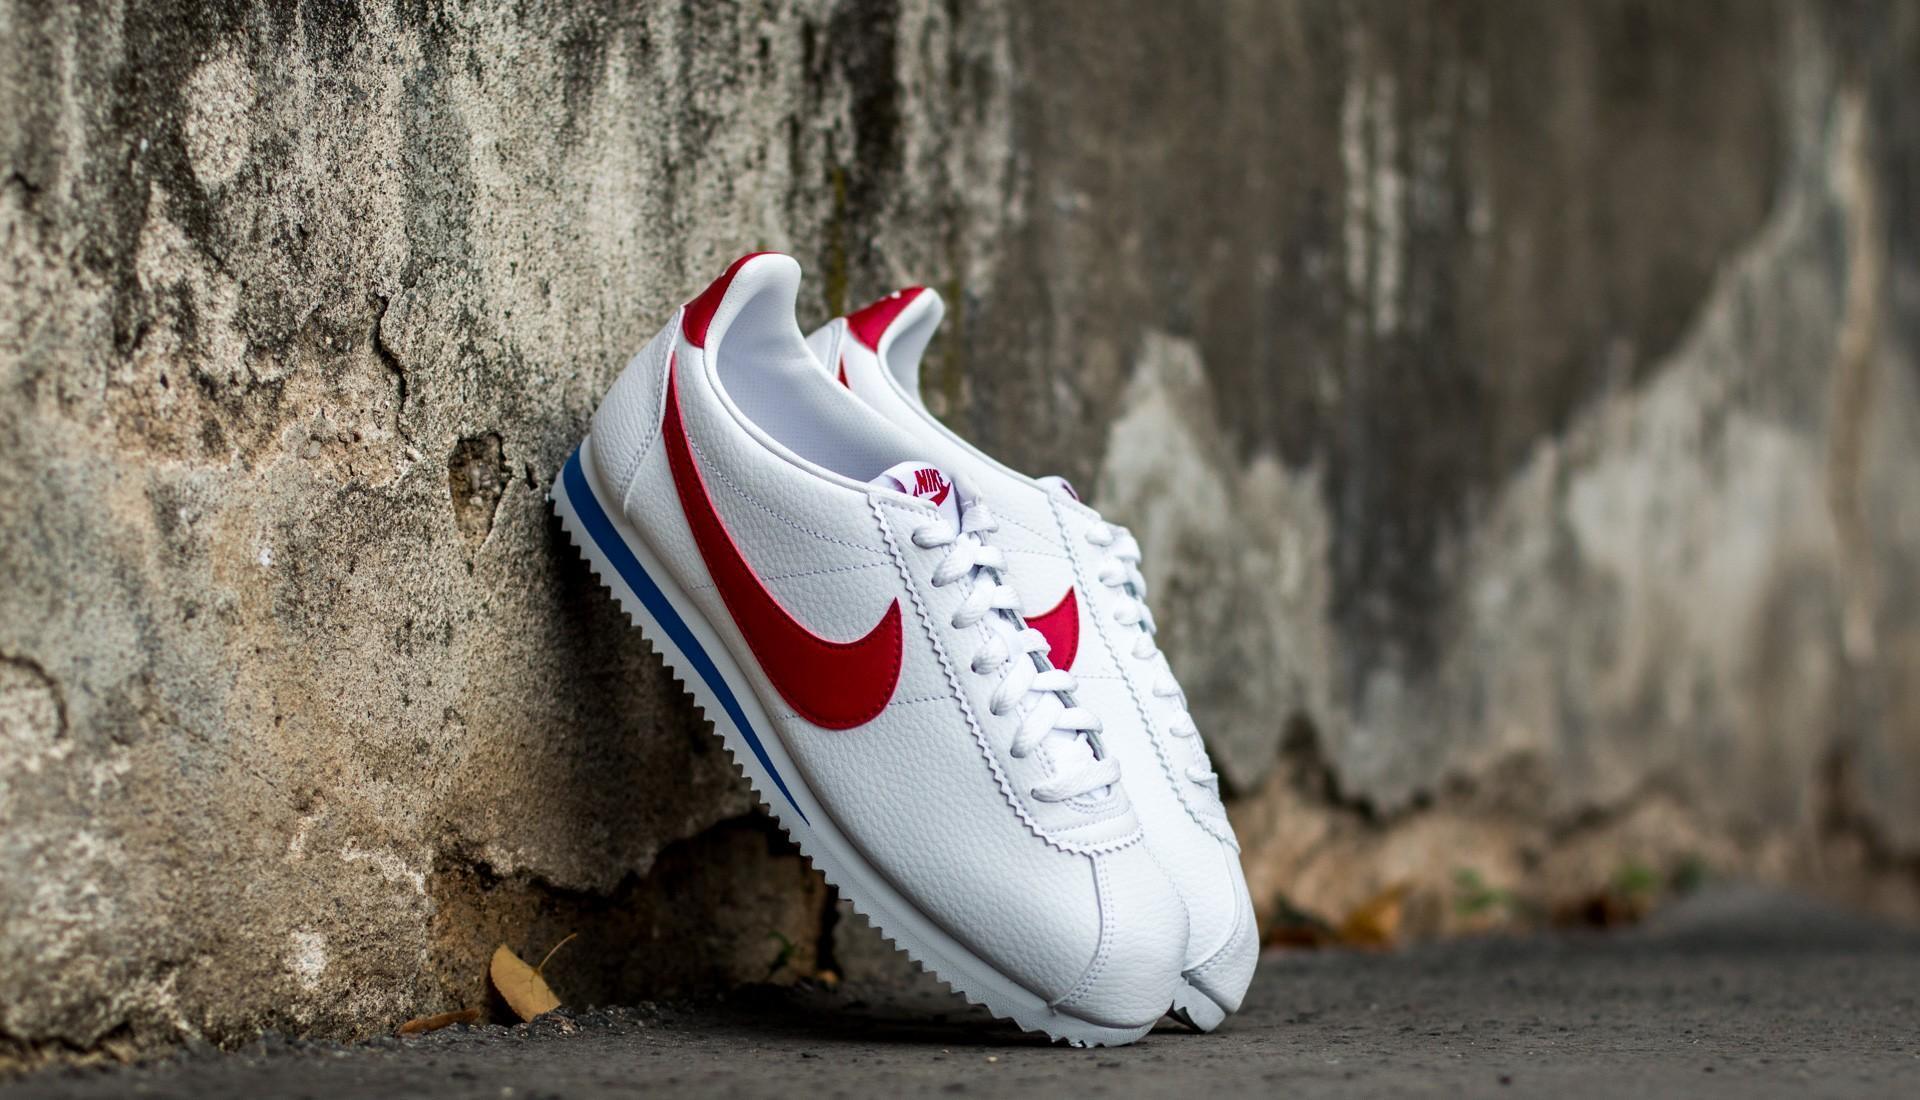 9425c5199ff2 Lyst - Nike Classic Cortez Leather White  Varsity Red-varsity Royal .